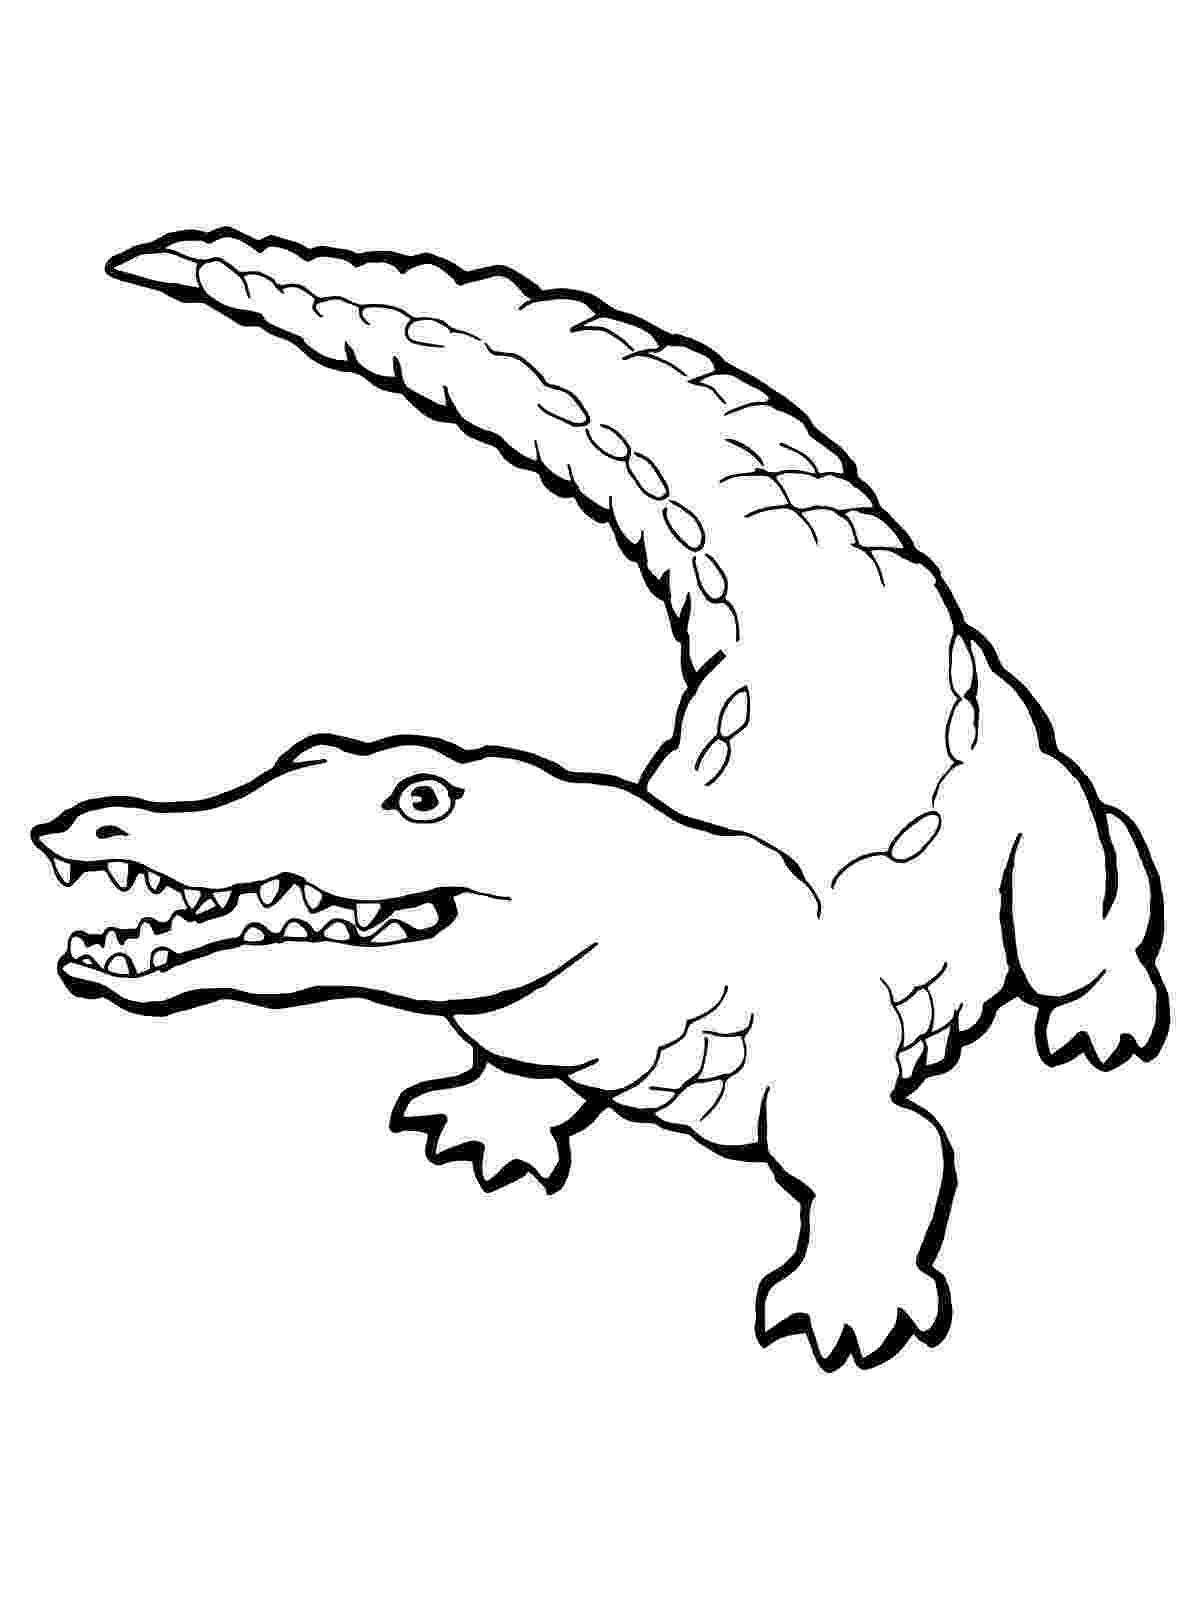 crocodile coloring free printable crocodile coloring pages for kids coloring crocodile 1 1